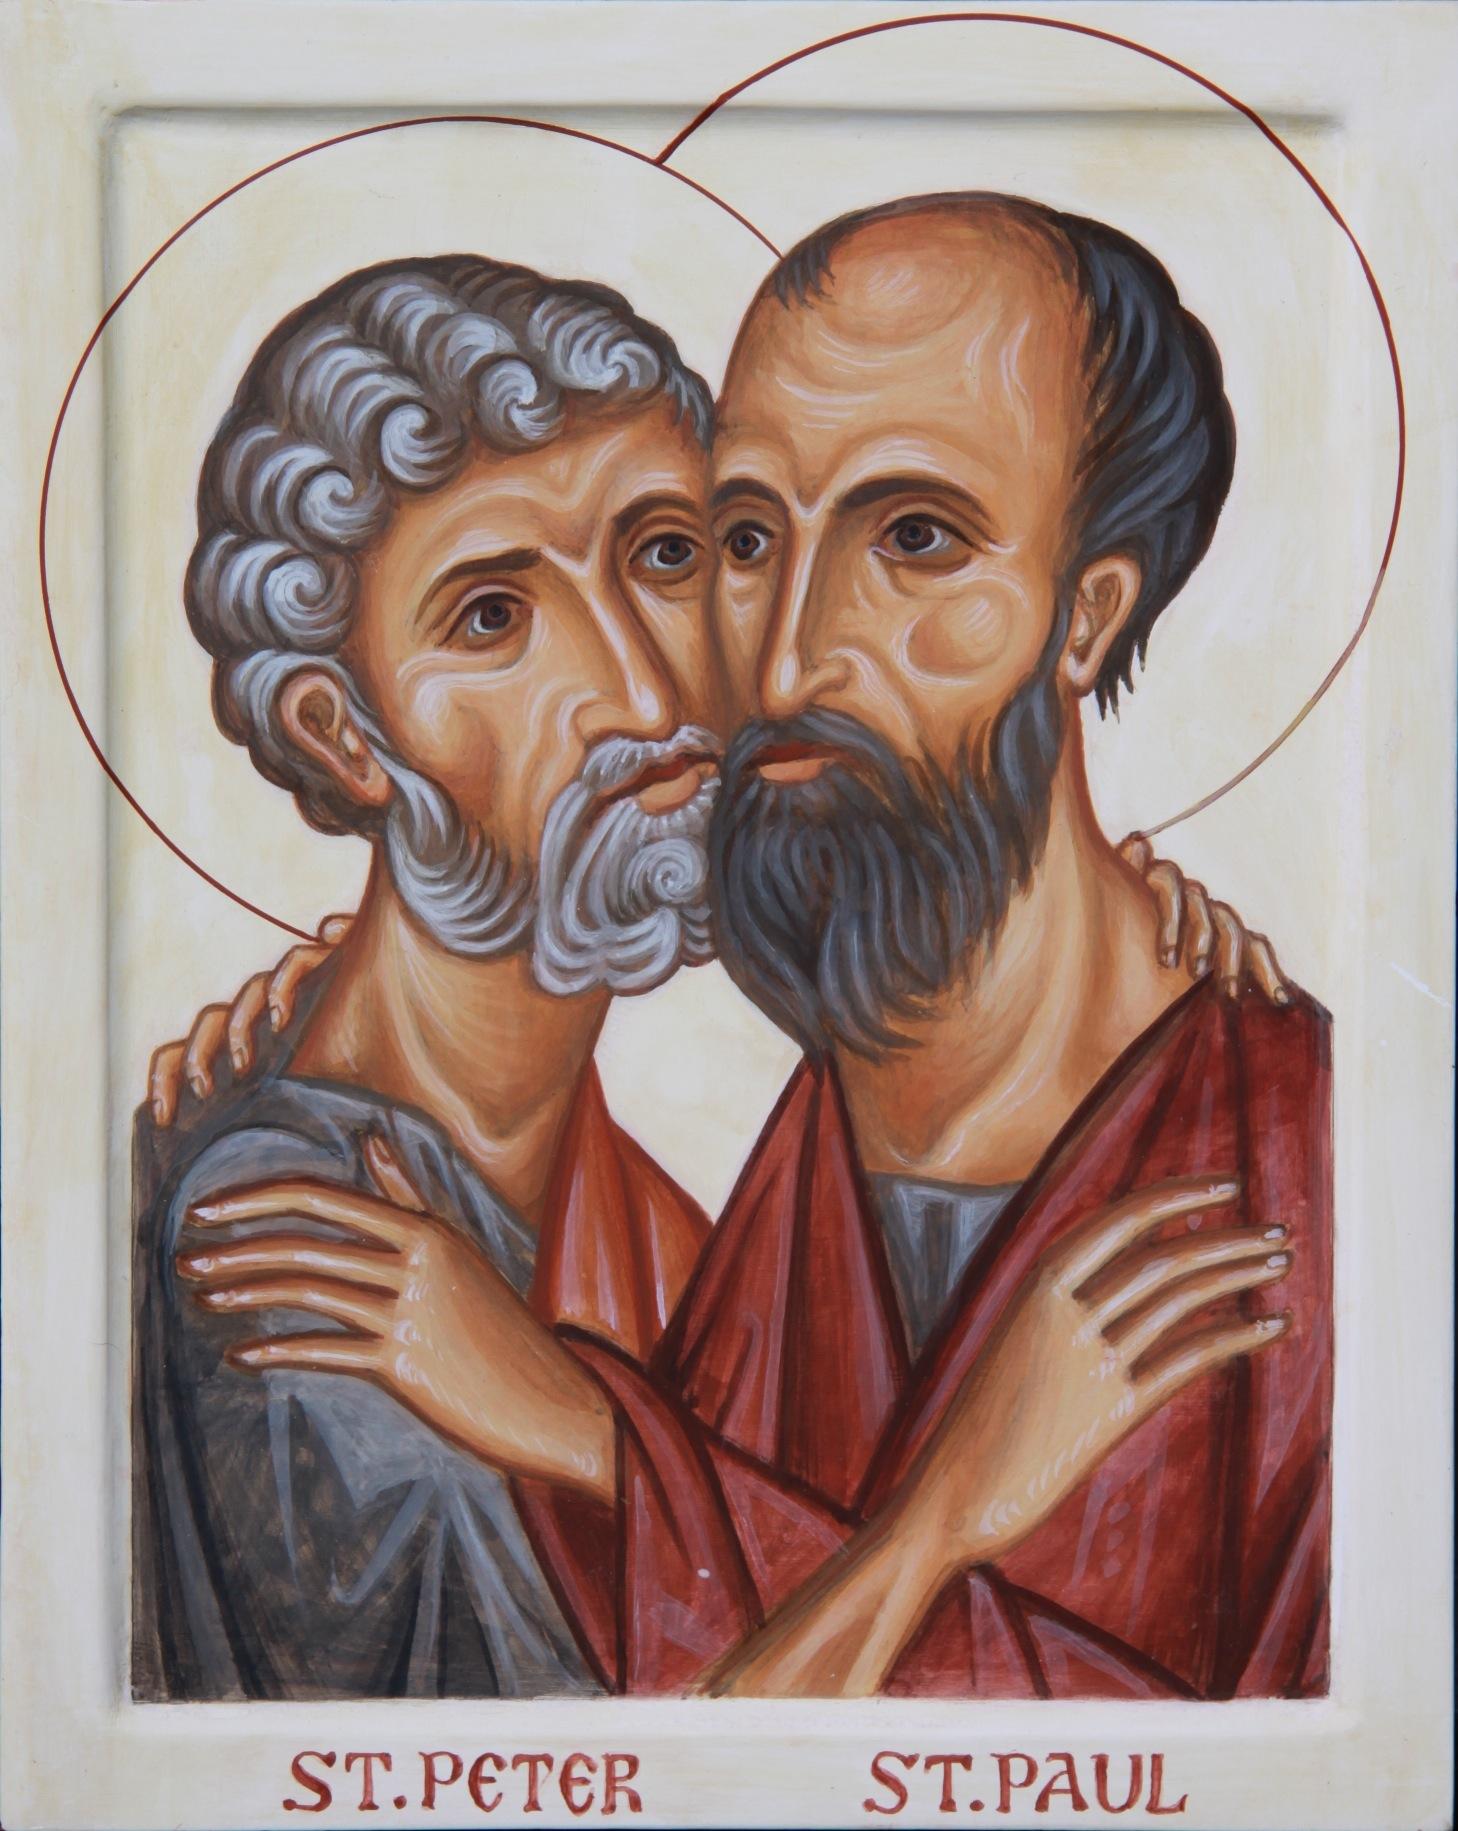 Apostles Peter and Paul - Christian preachers